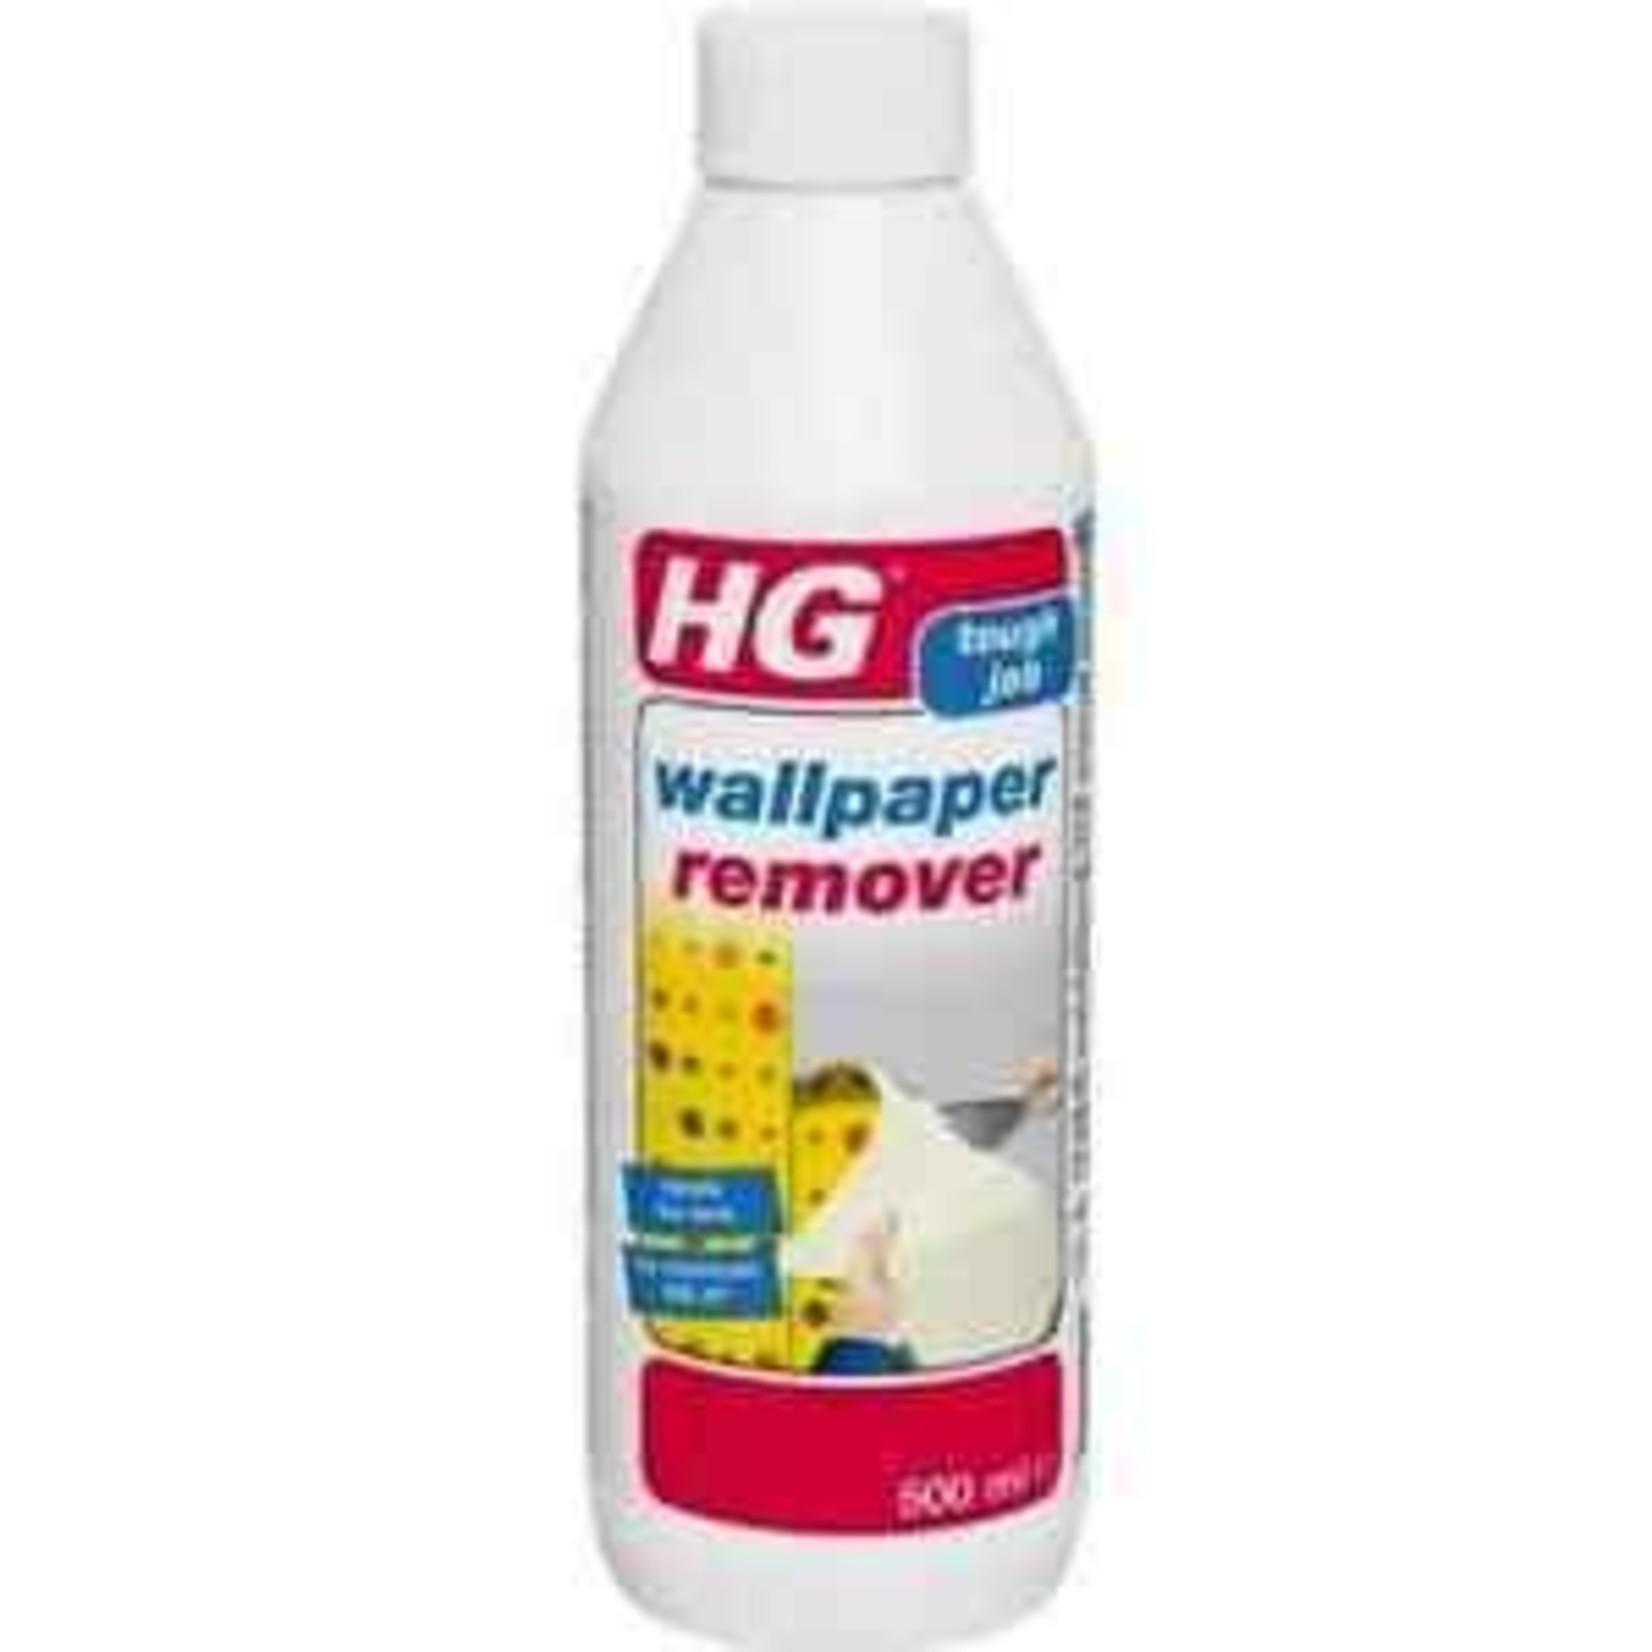 HG HG WALLPAPER REMOVER TOUGH JOB